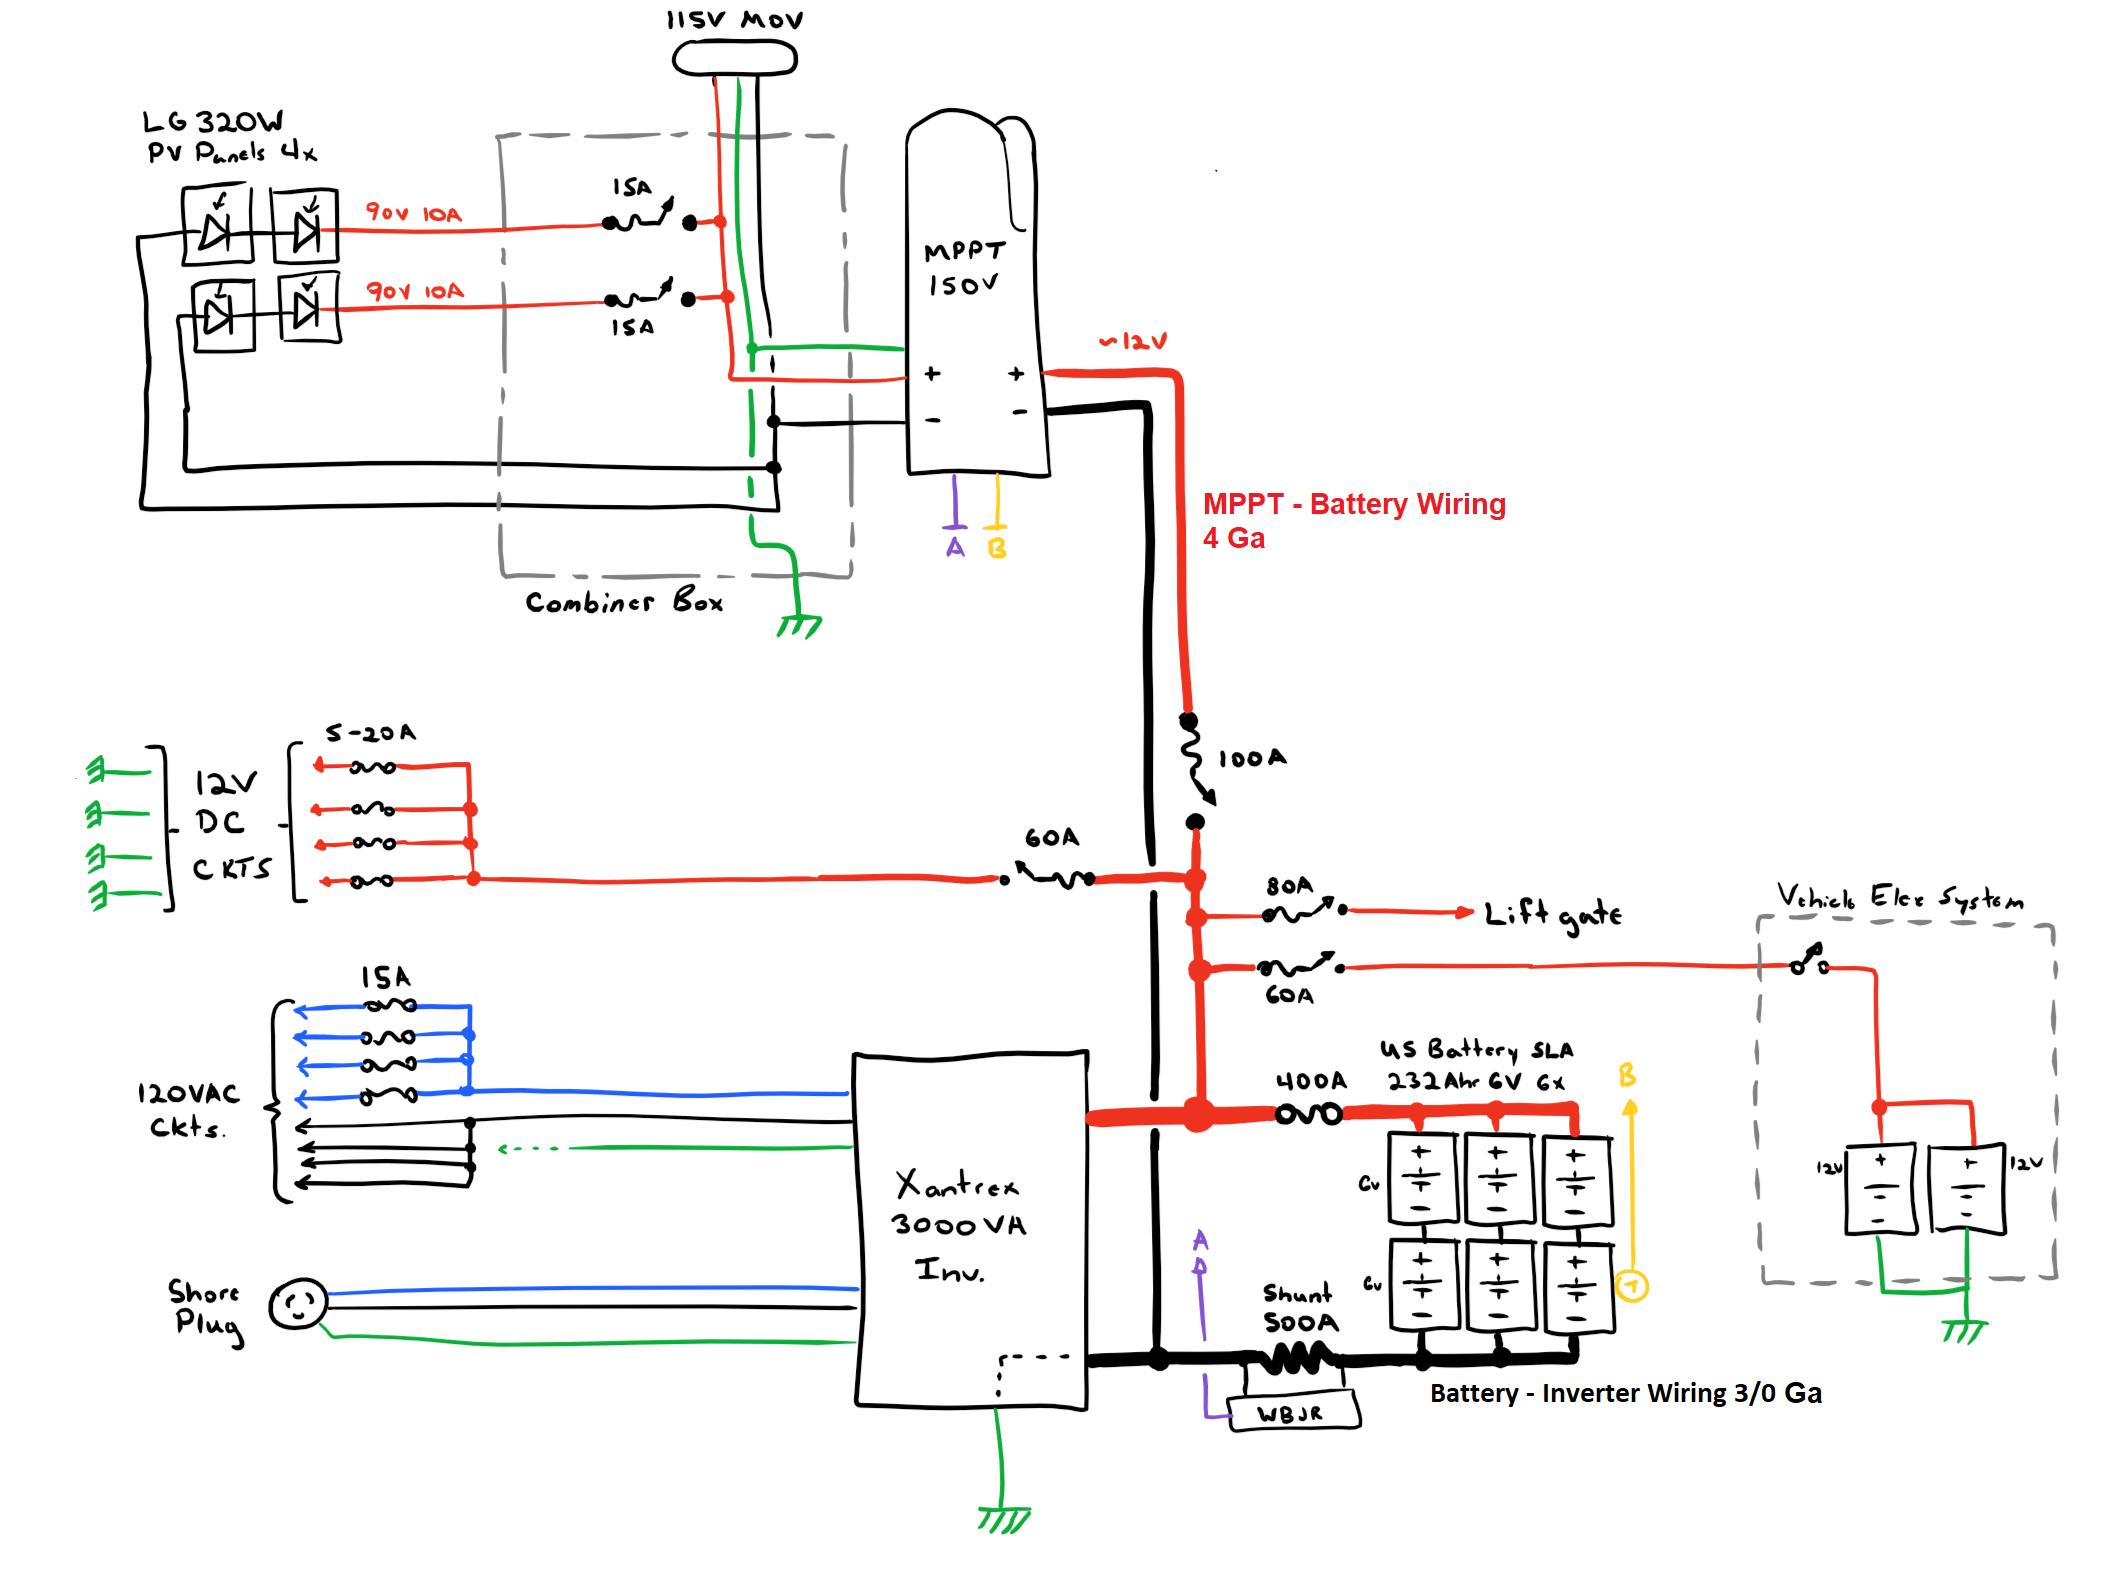 solar panel array wiring diagram automotive schematics big box truck